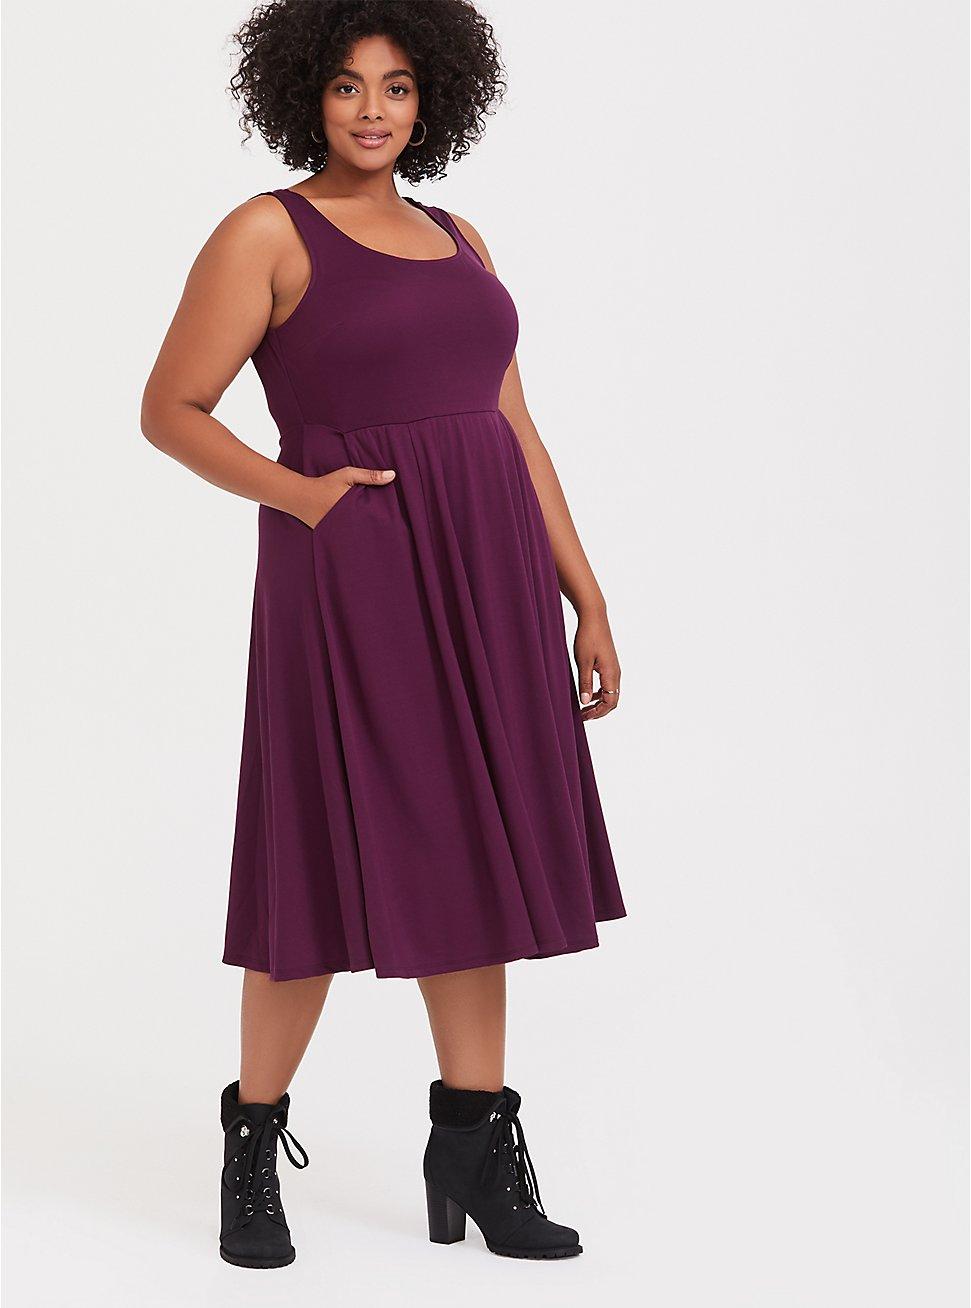 Burgundy Purple Premium Ponte Skater Dress, HIGHLAND THISTLE, hi-res